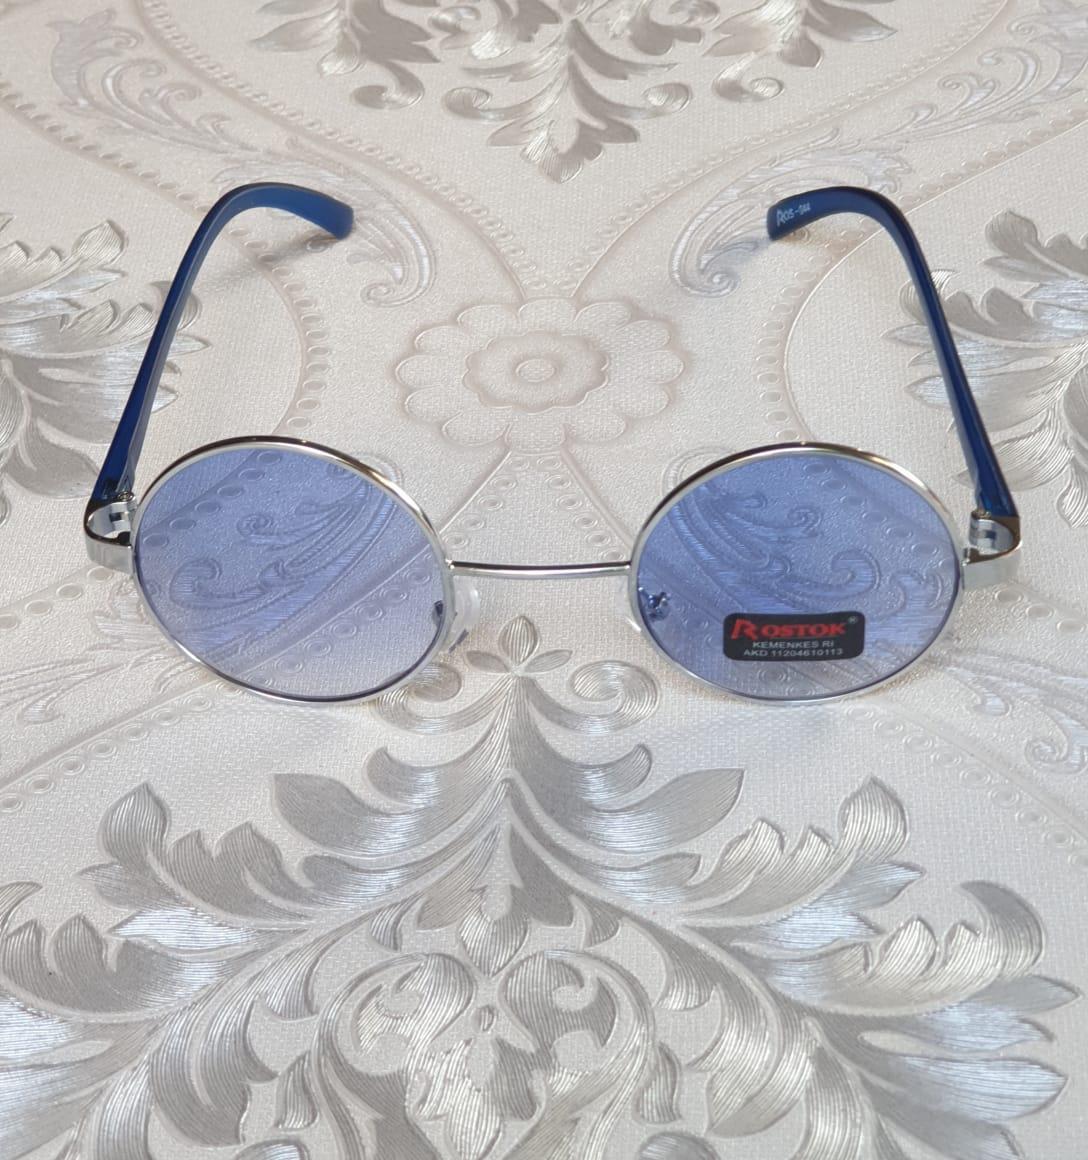 BAYAR DI TEMPAT/Kacamata Unisex Vintage Klasik Bulat Bundar rostok biru/kacamata gaya trendy.sejaht